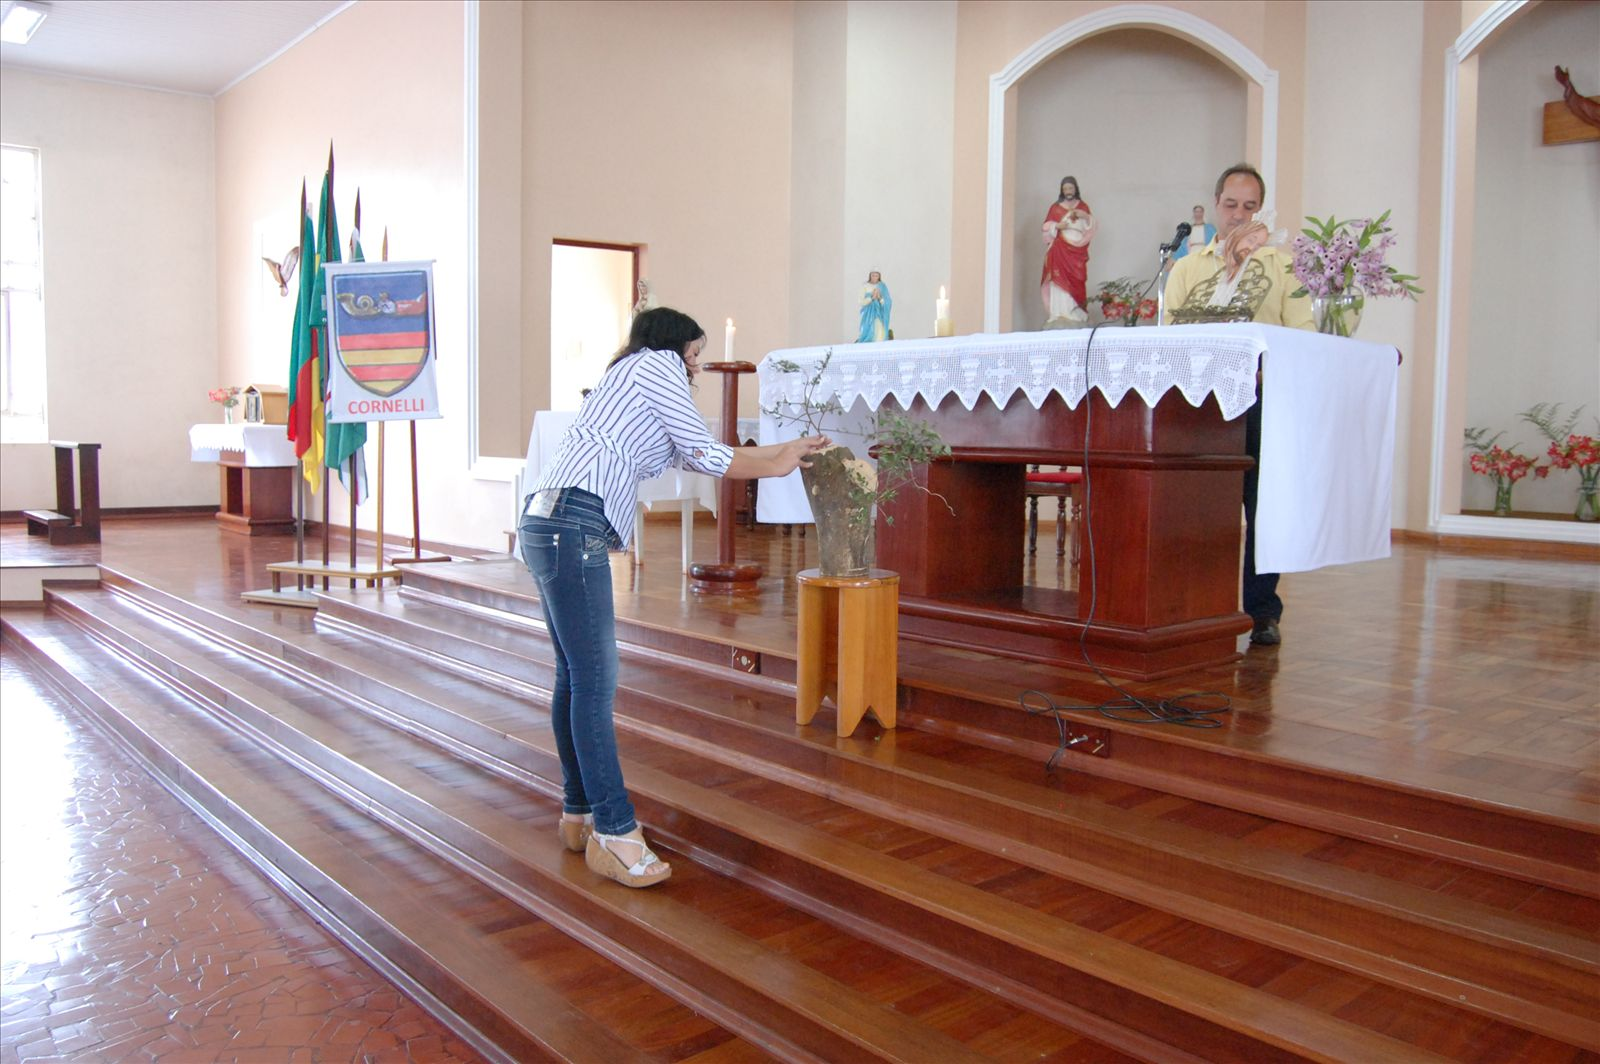 2º Encontro Família Cornelli - 11.10.2009 (124)_0